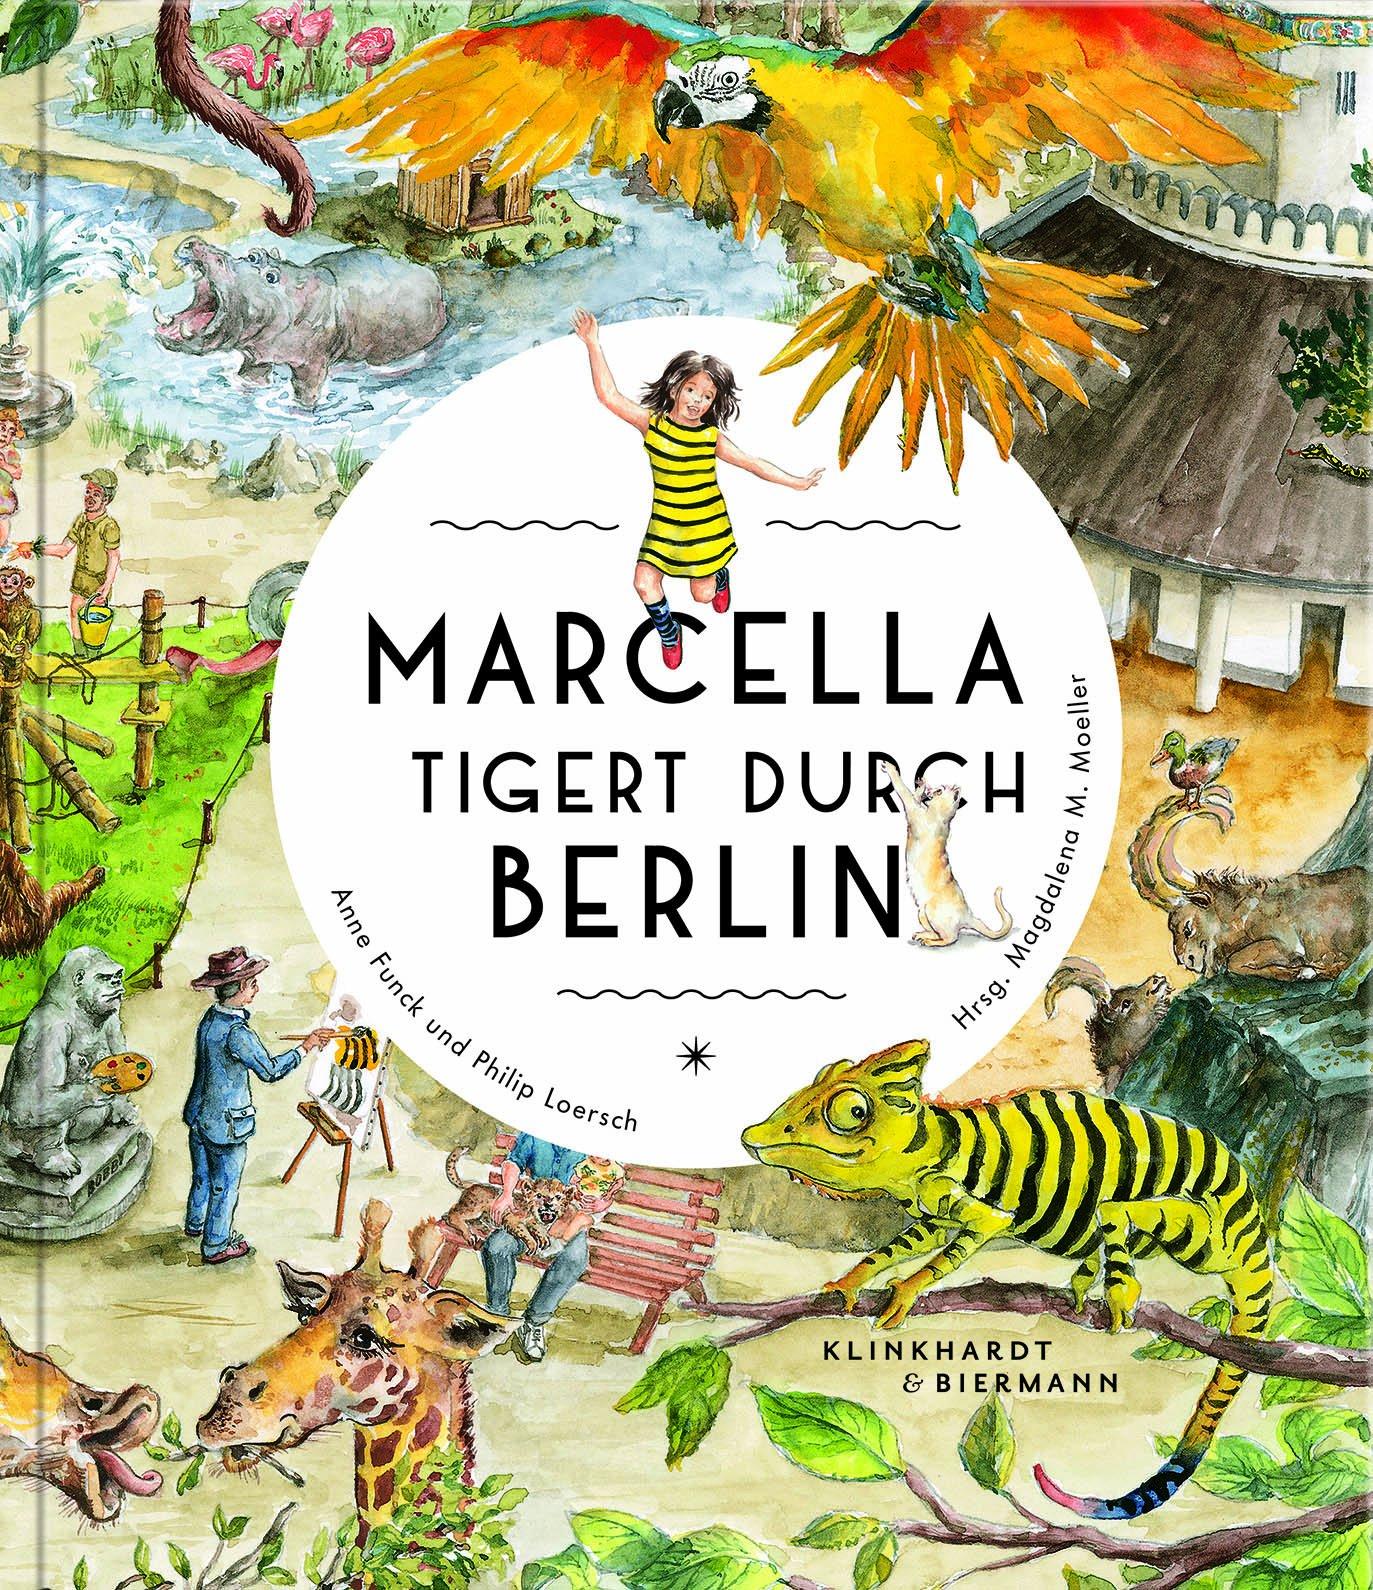 Marcella tigert durch Berlin